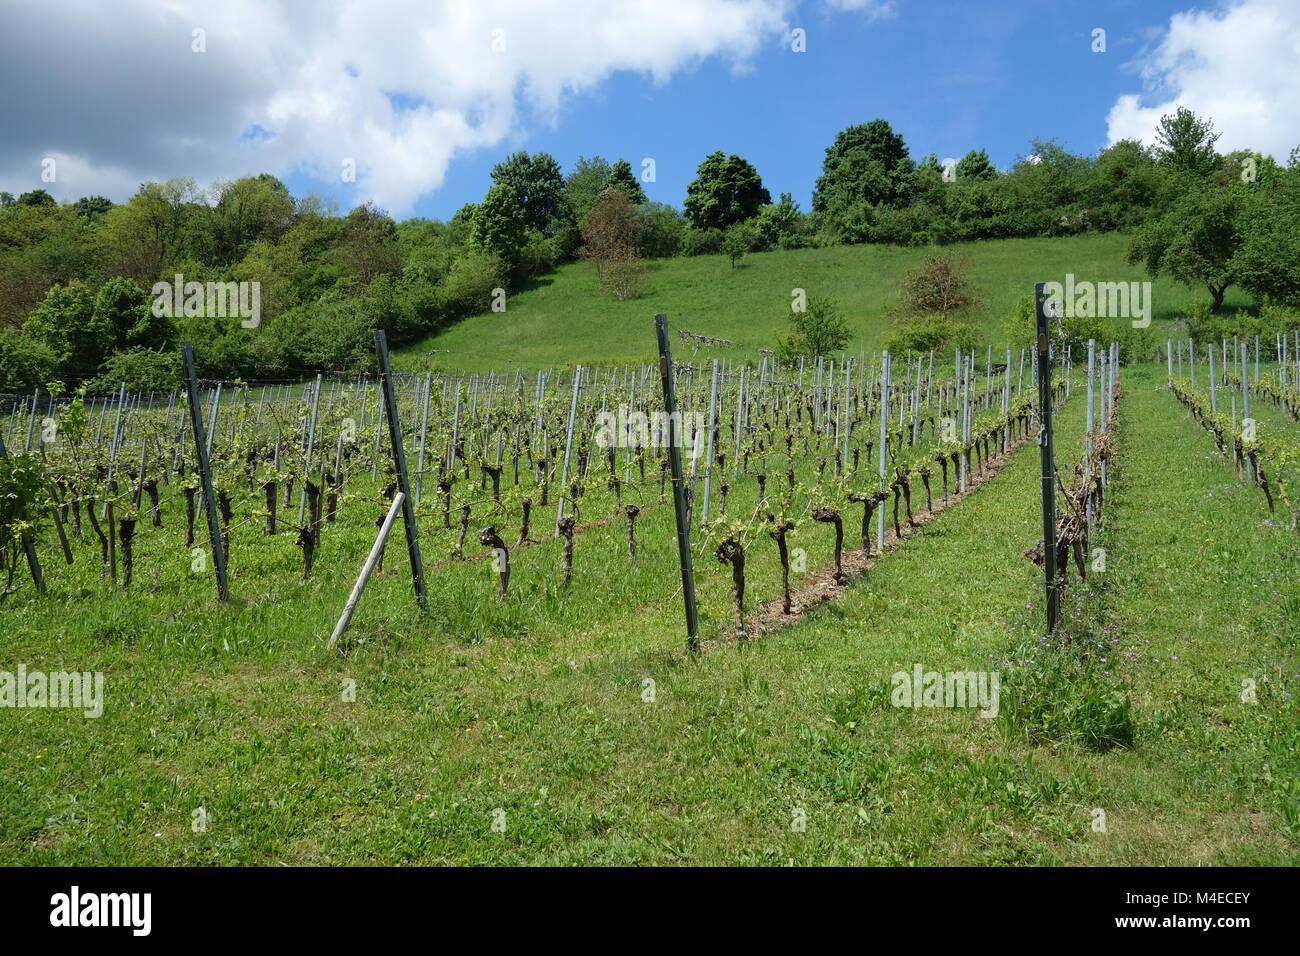 Vitis vinifera, Grape vine, young shoots Stock Photo